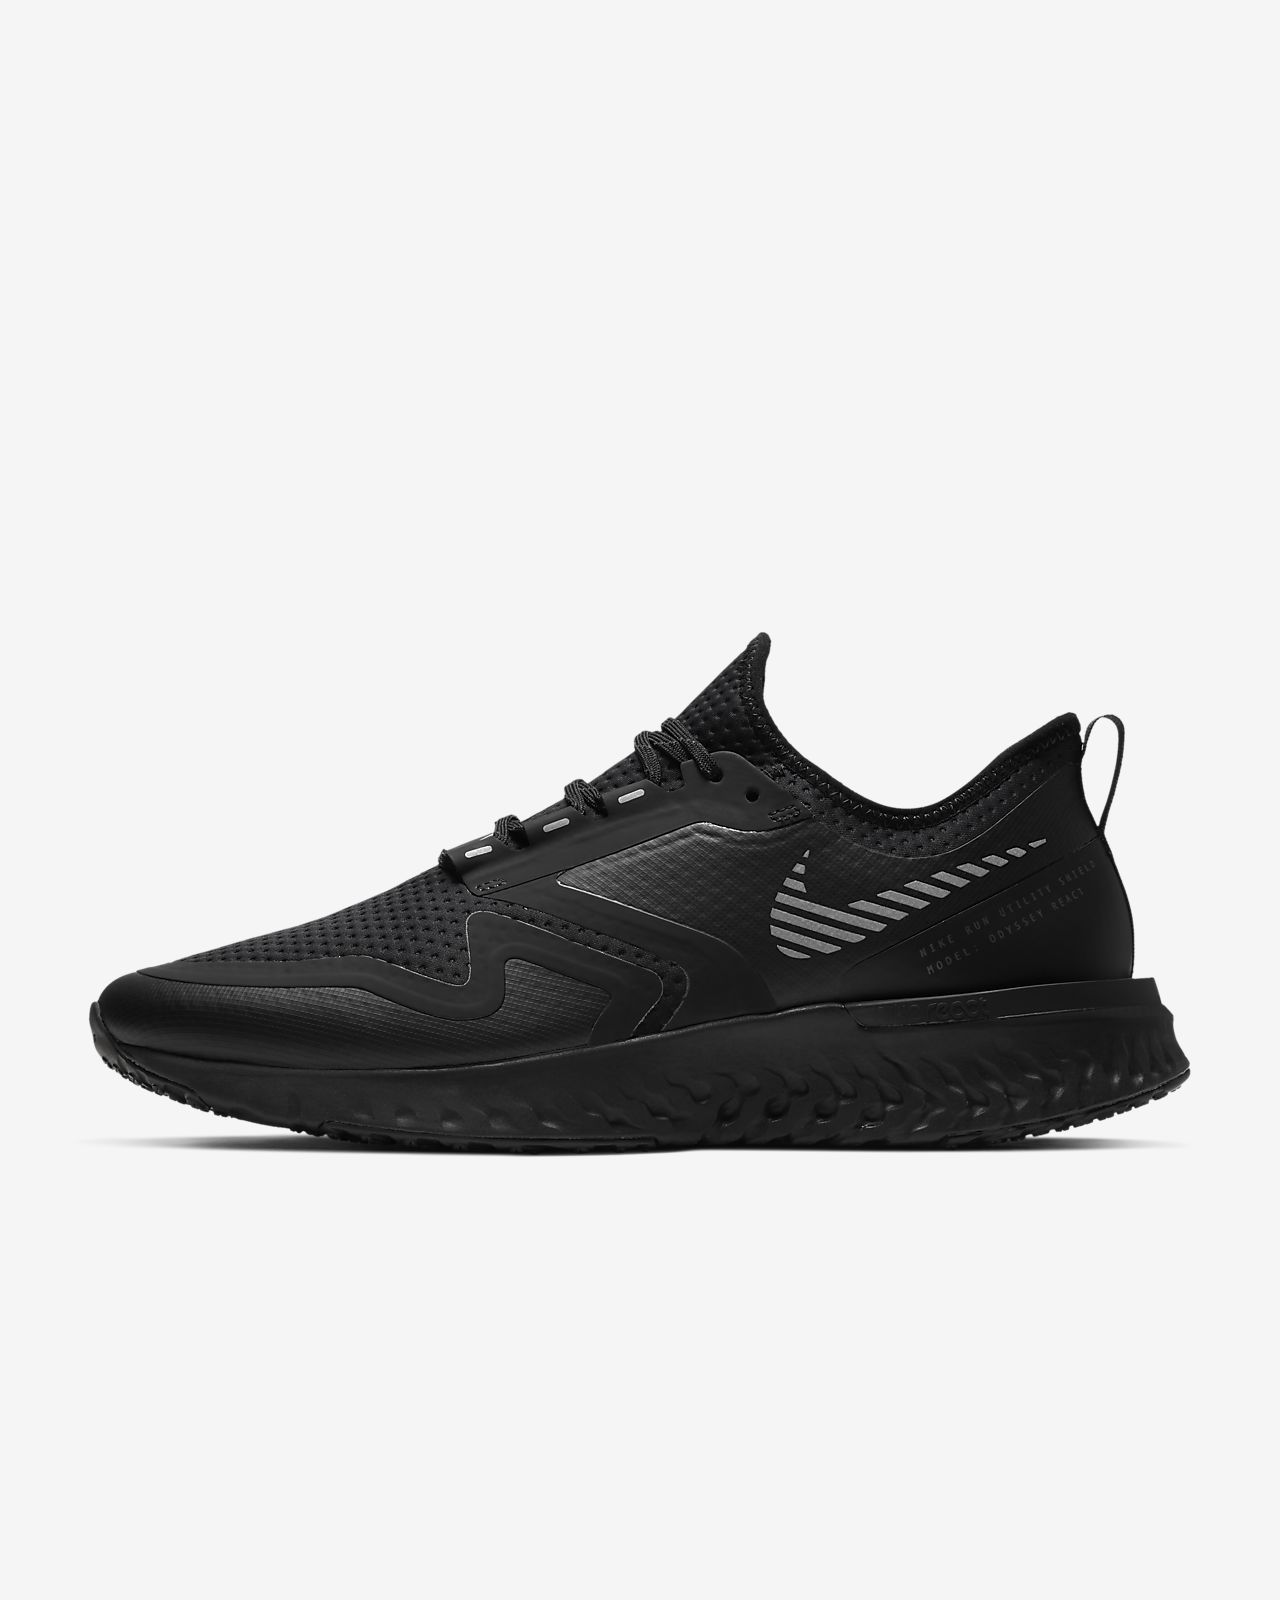 Nike Odyssey React Shield 2 Sabatilles de running - Home